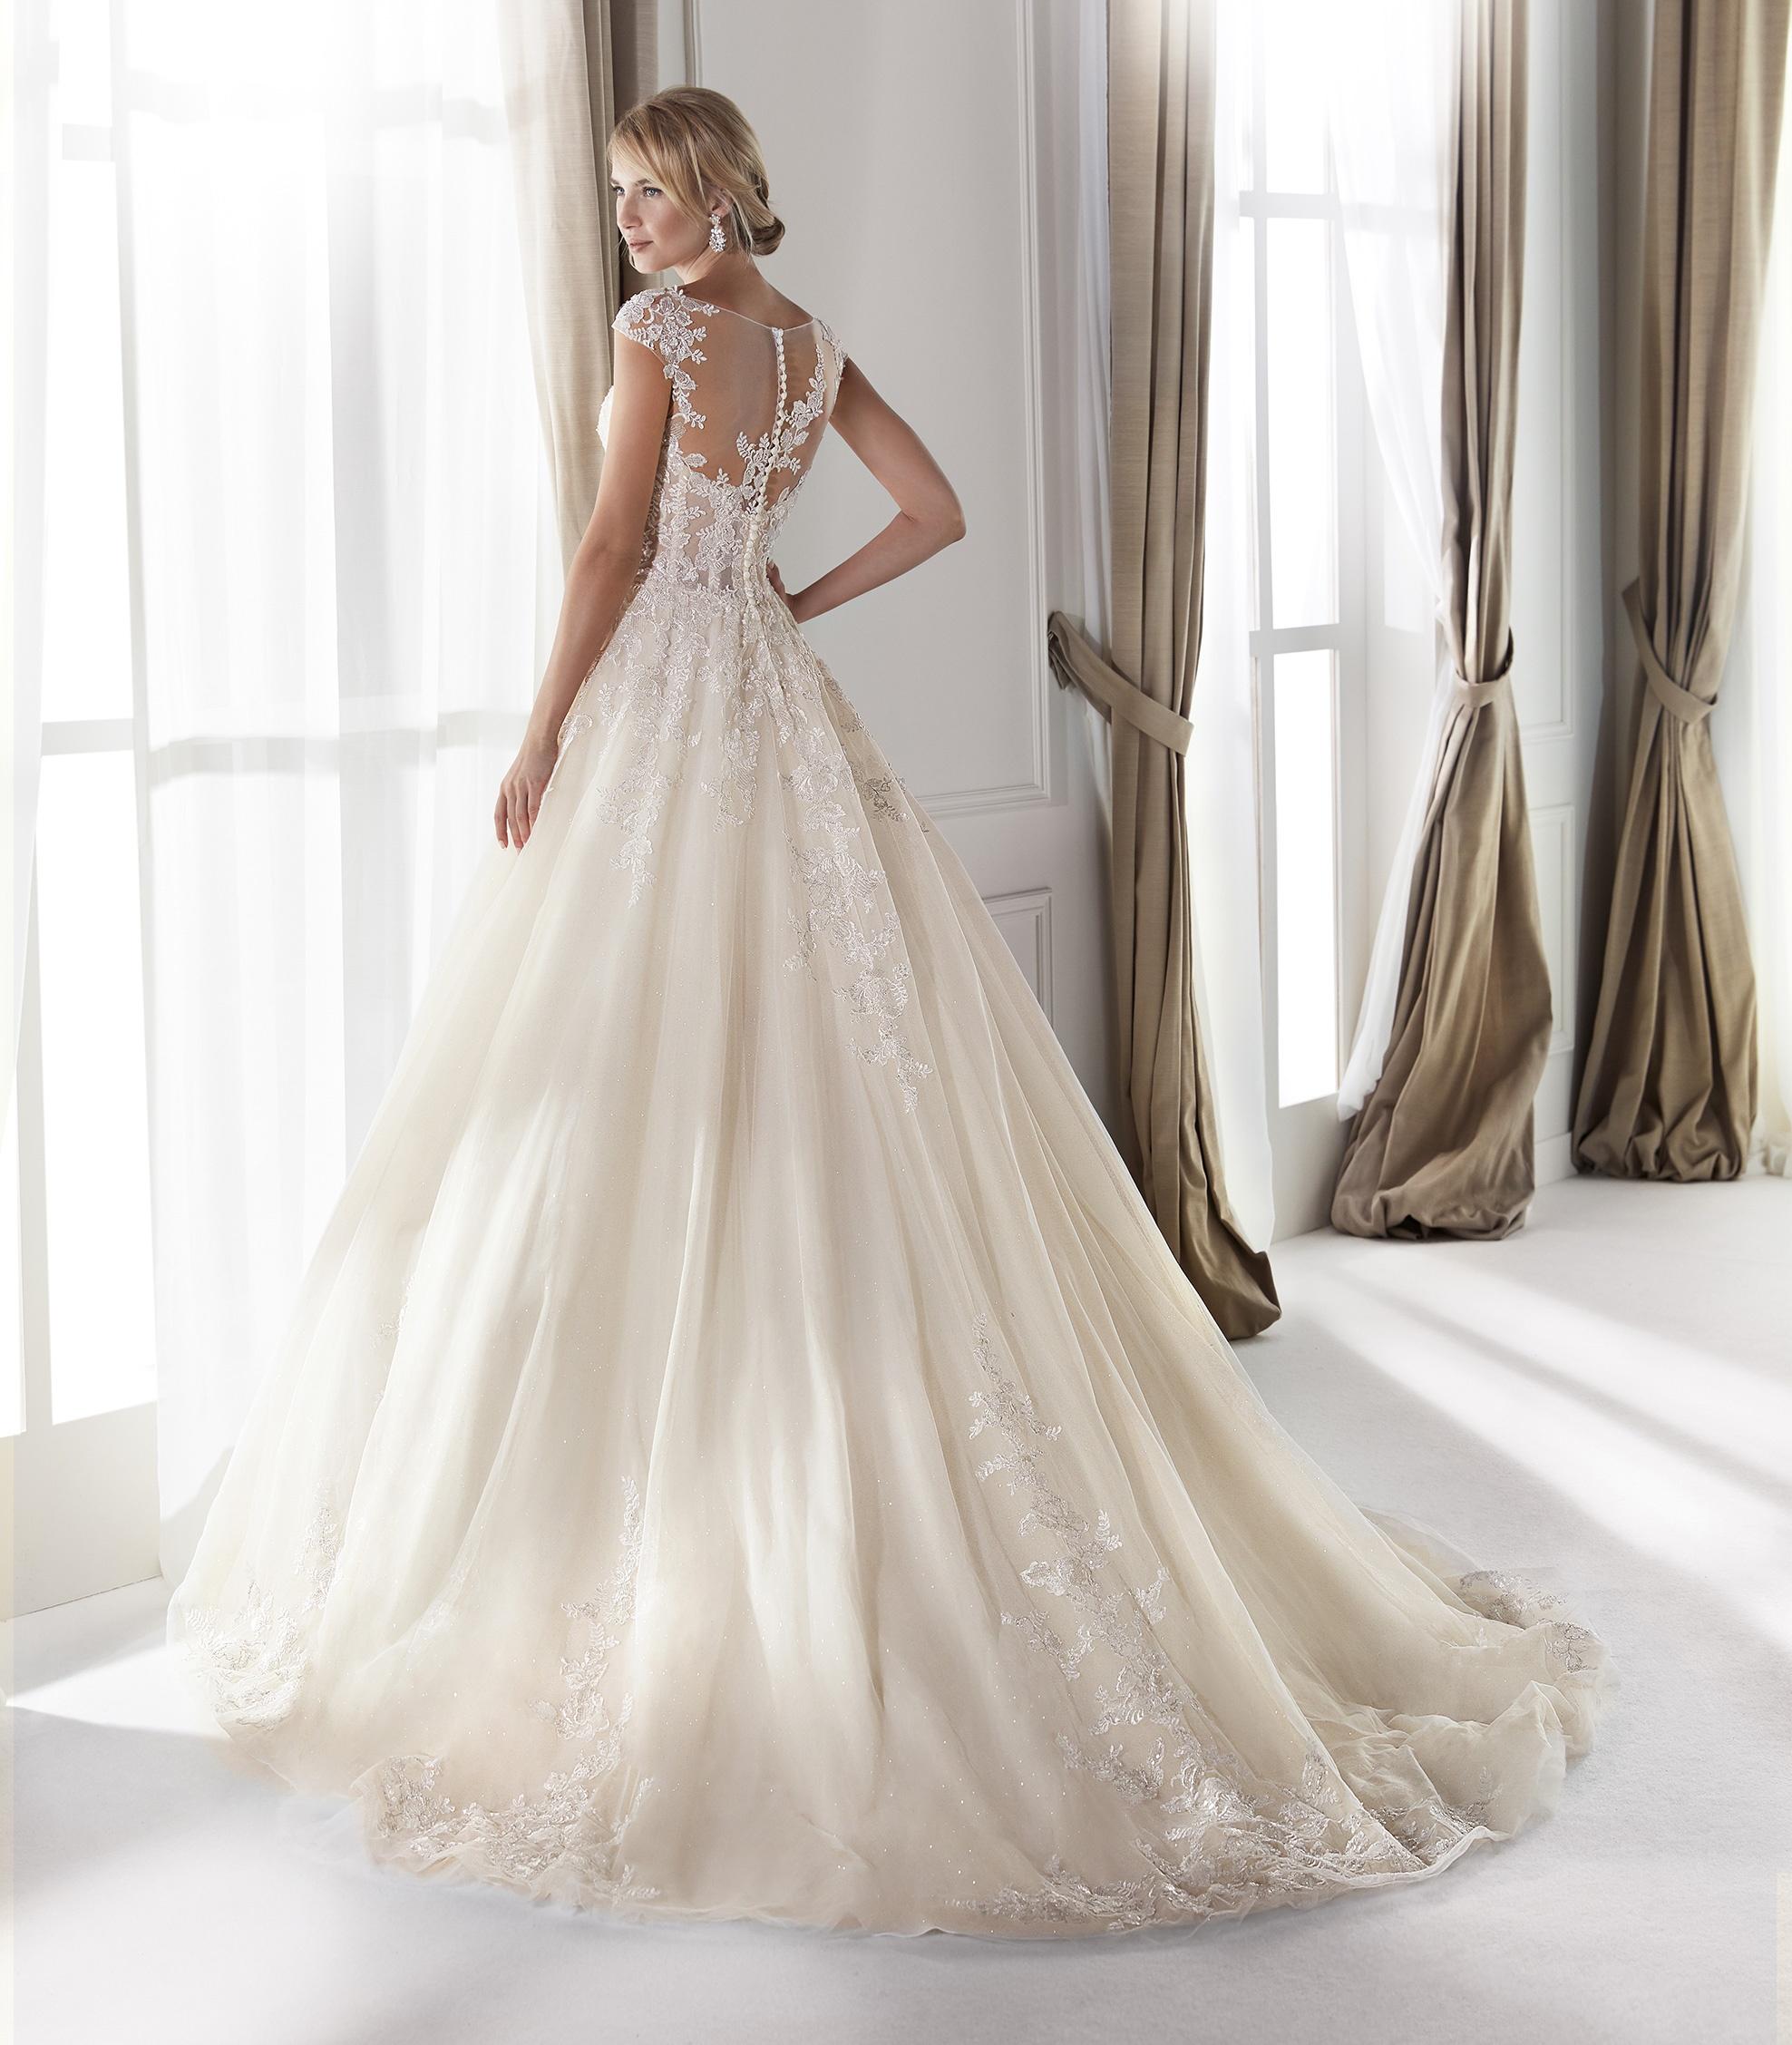 nicole-spose-NIA20821-Nicole-moda-sposa-2020-166.jpg